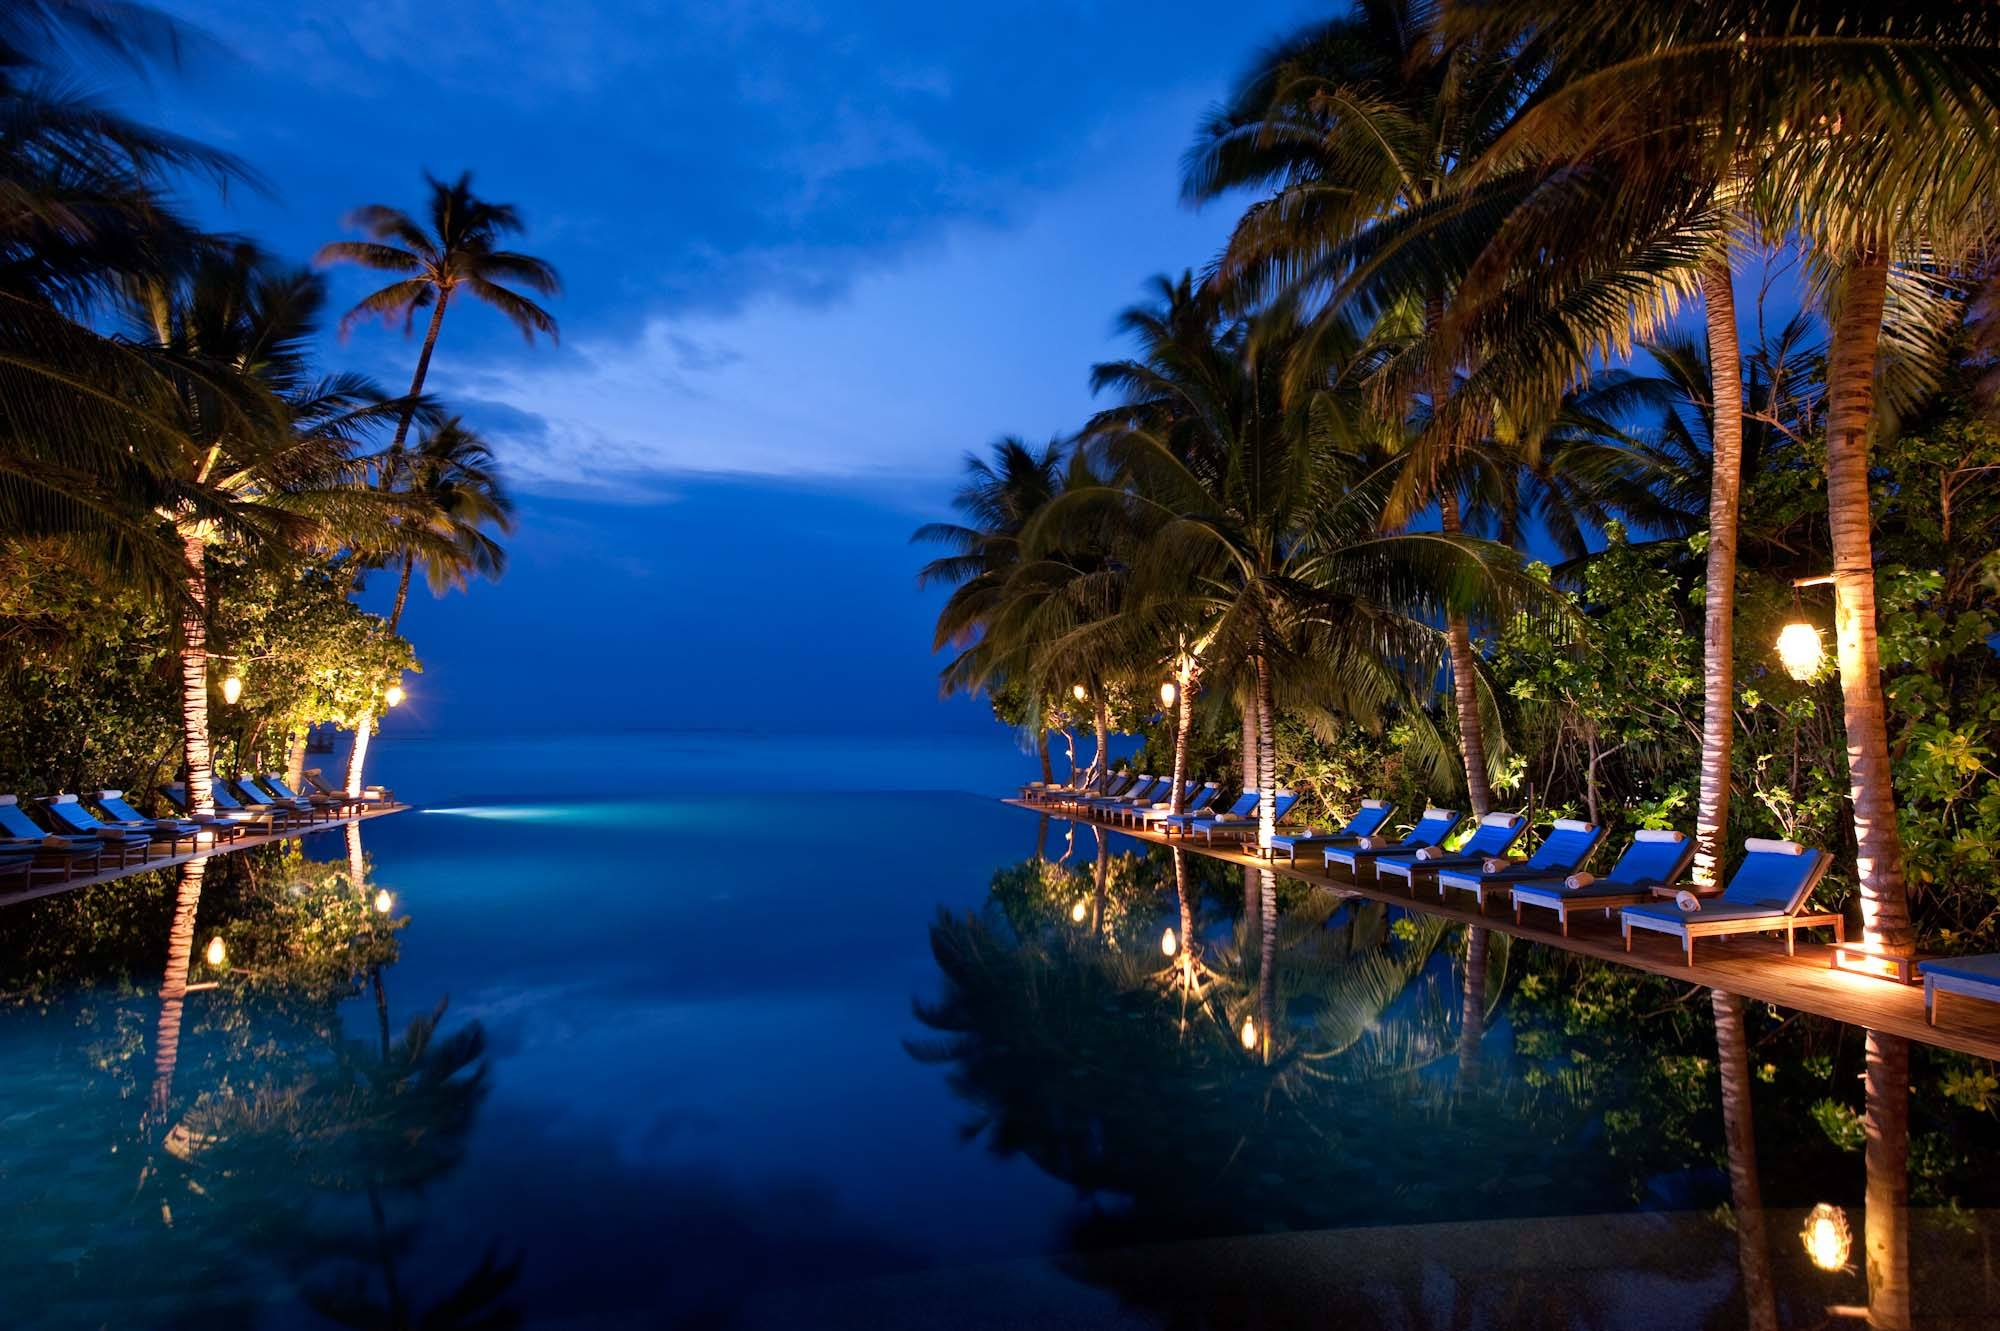 Hilton Hotel Maldives Iru Fushi